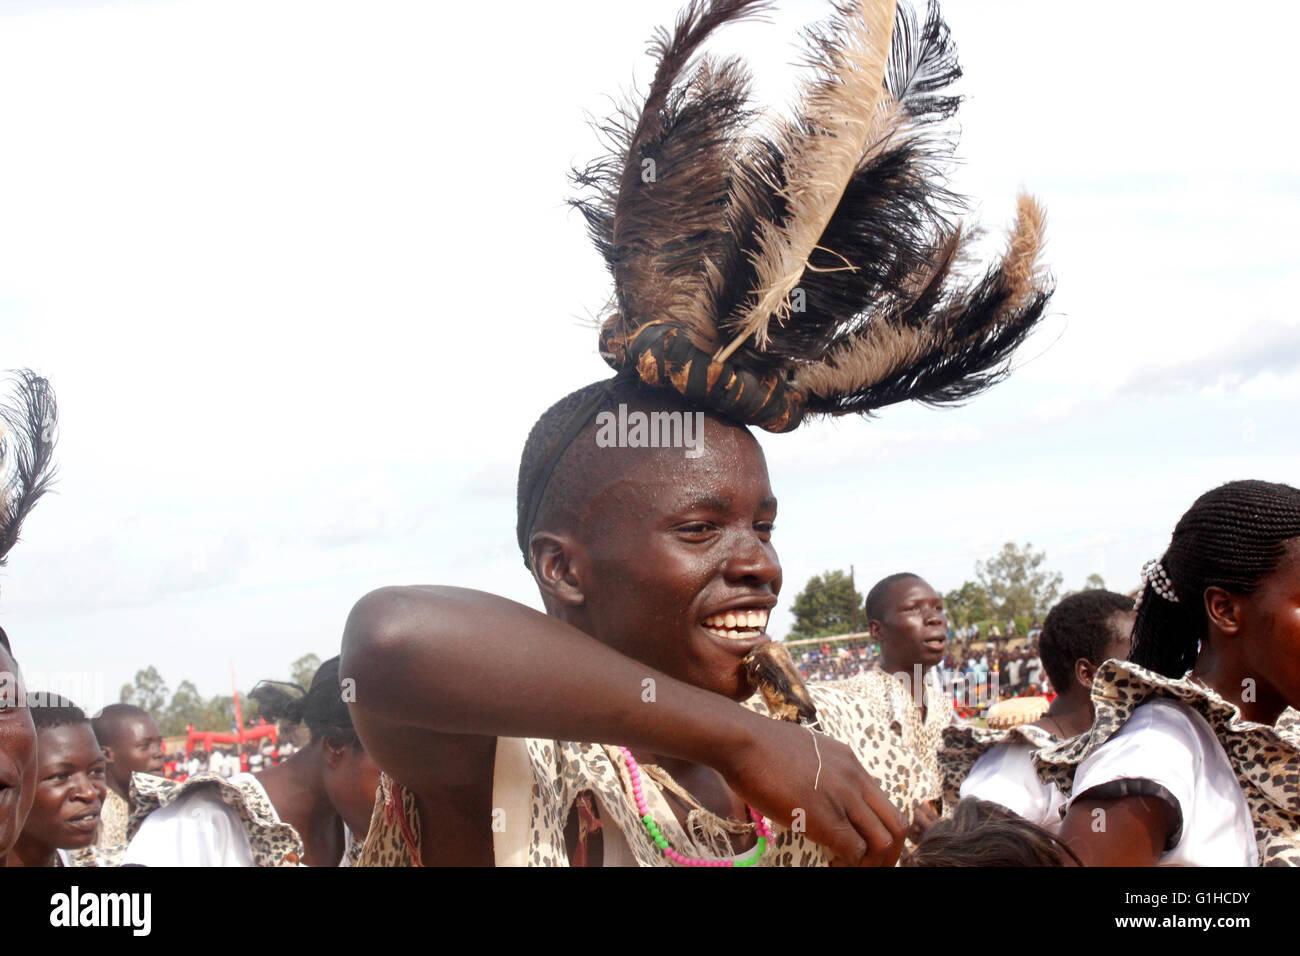 Uganda Music And Dance Stock Photos & Uganda Music And Dance